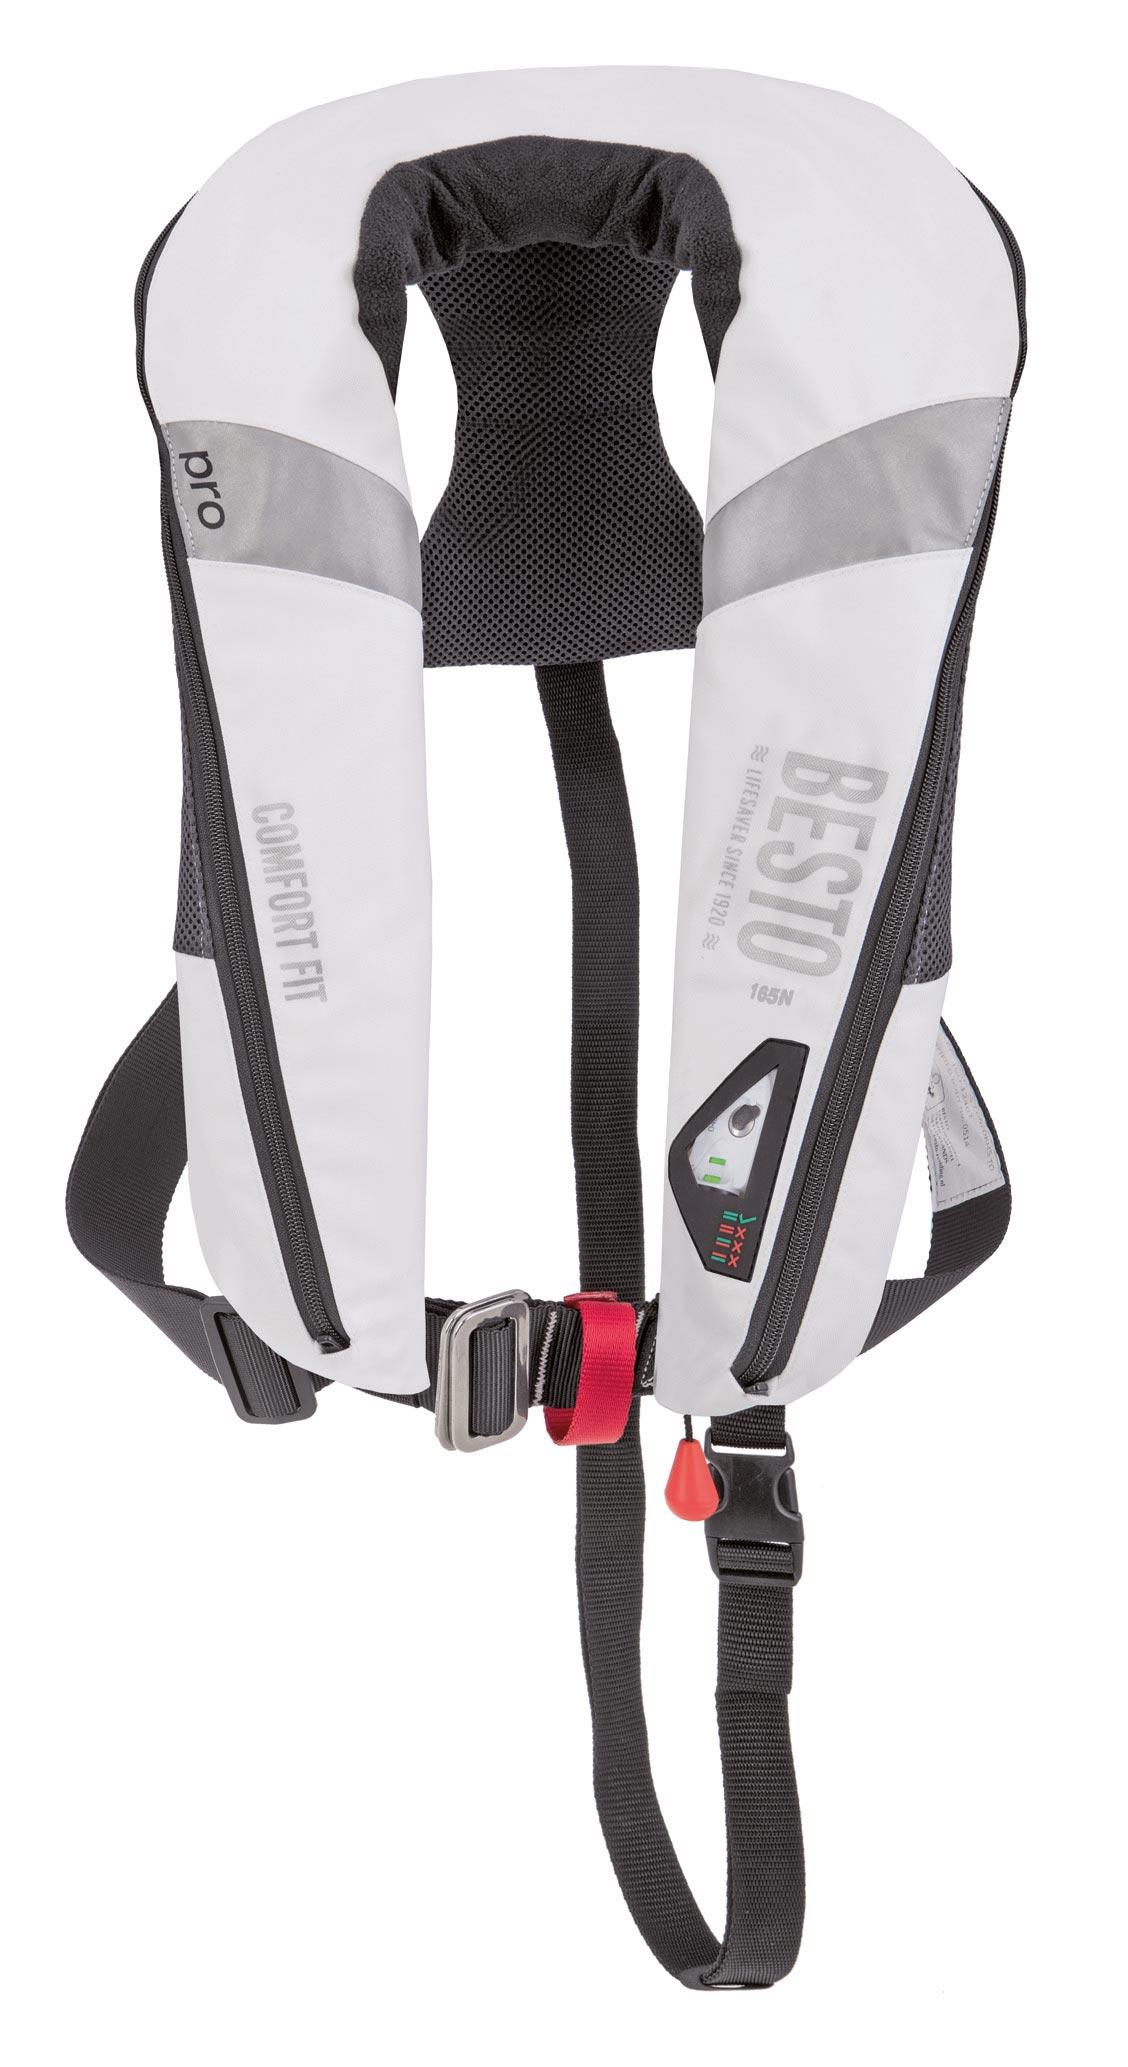 Besto Comfort Fit Pro 165N Rettungsweste weiss